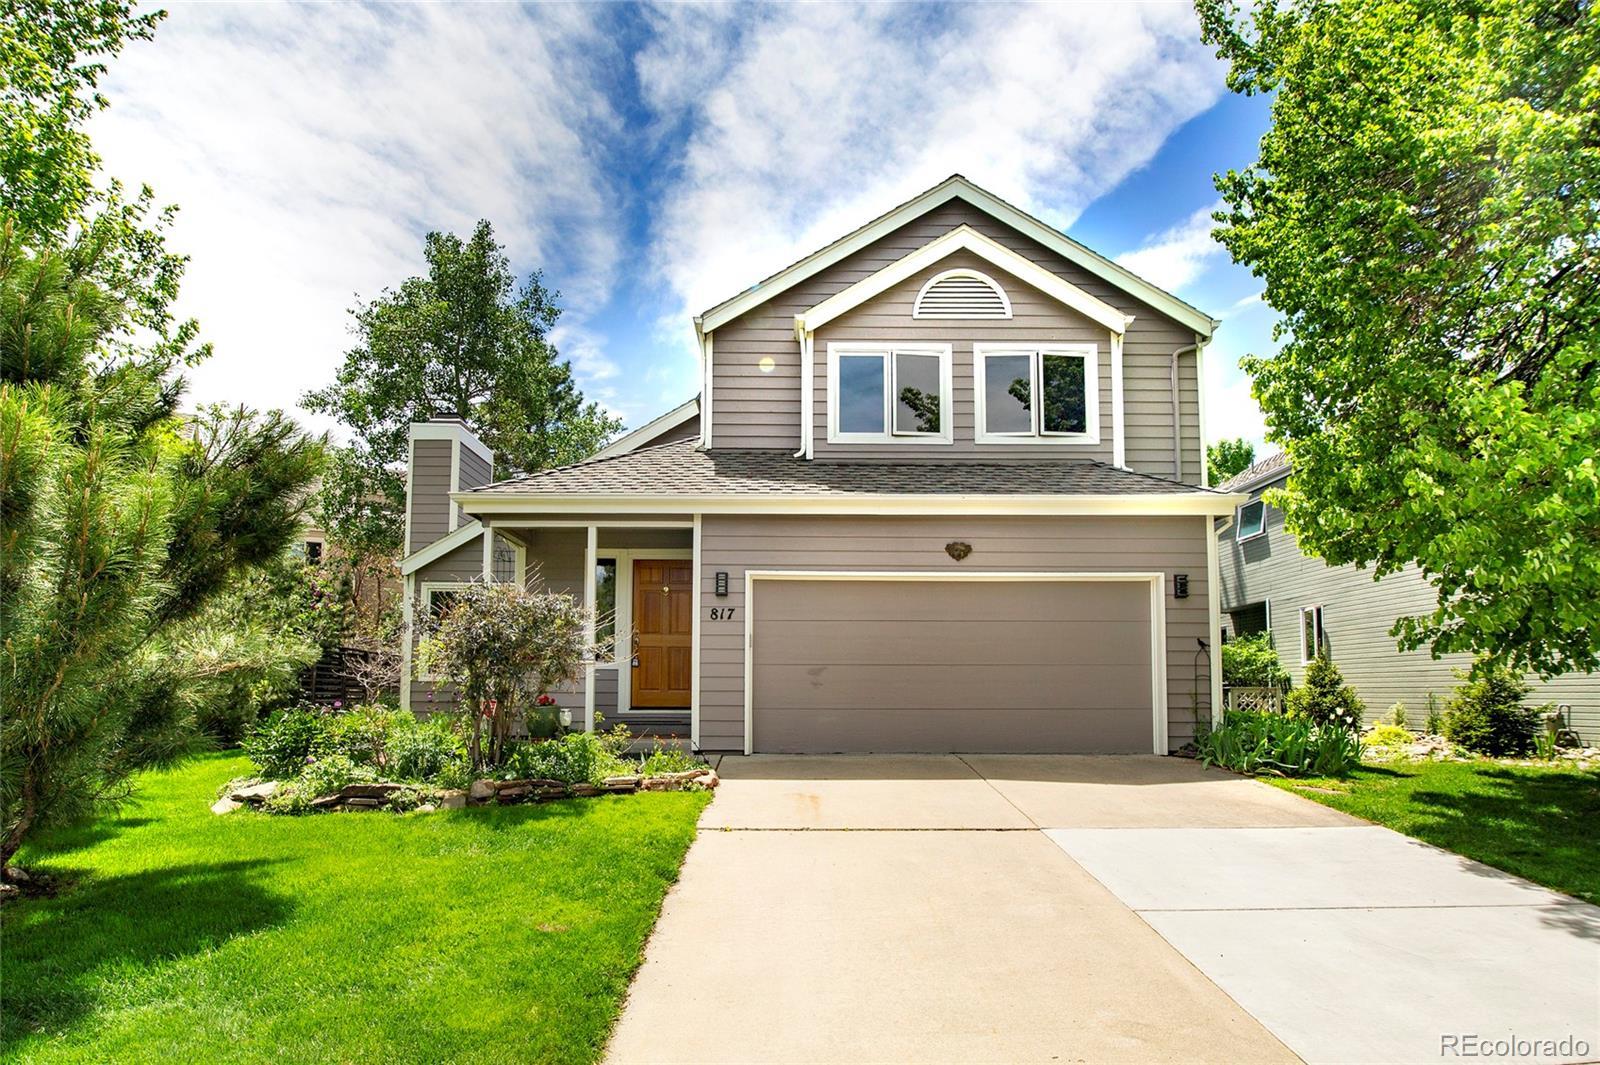 817 Racquet Lane Property Photo - Boulder, CO real estate listing